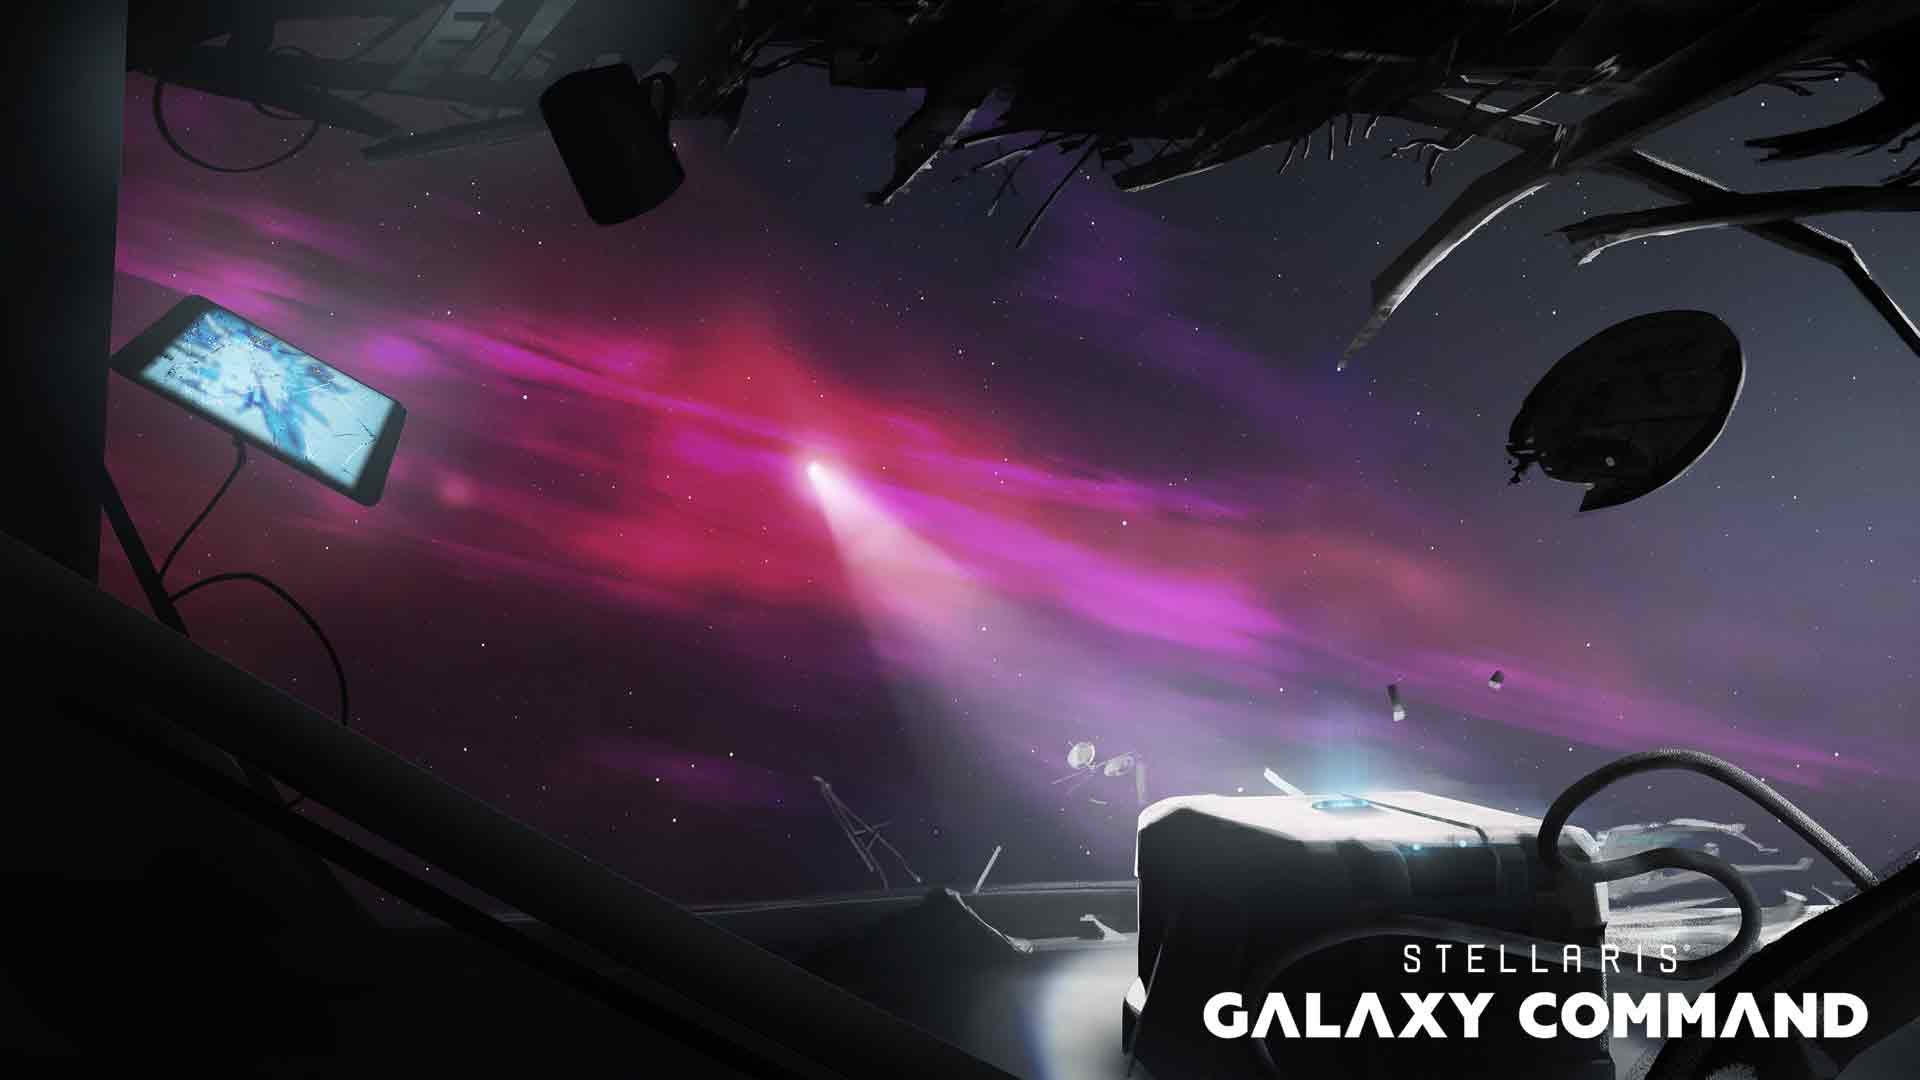 Stellaris-ไทย-เกมสำรวจจักรวาล1